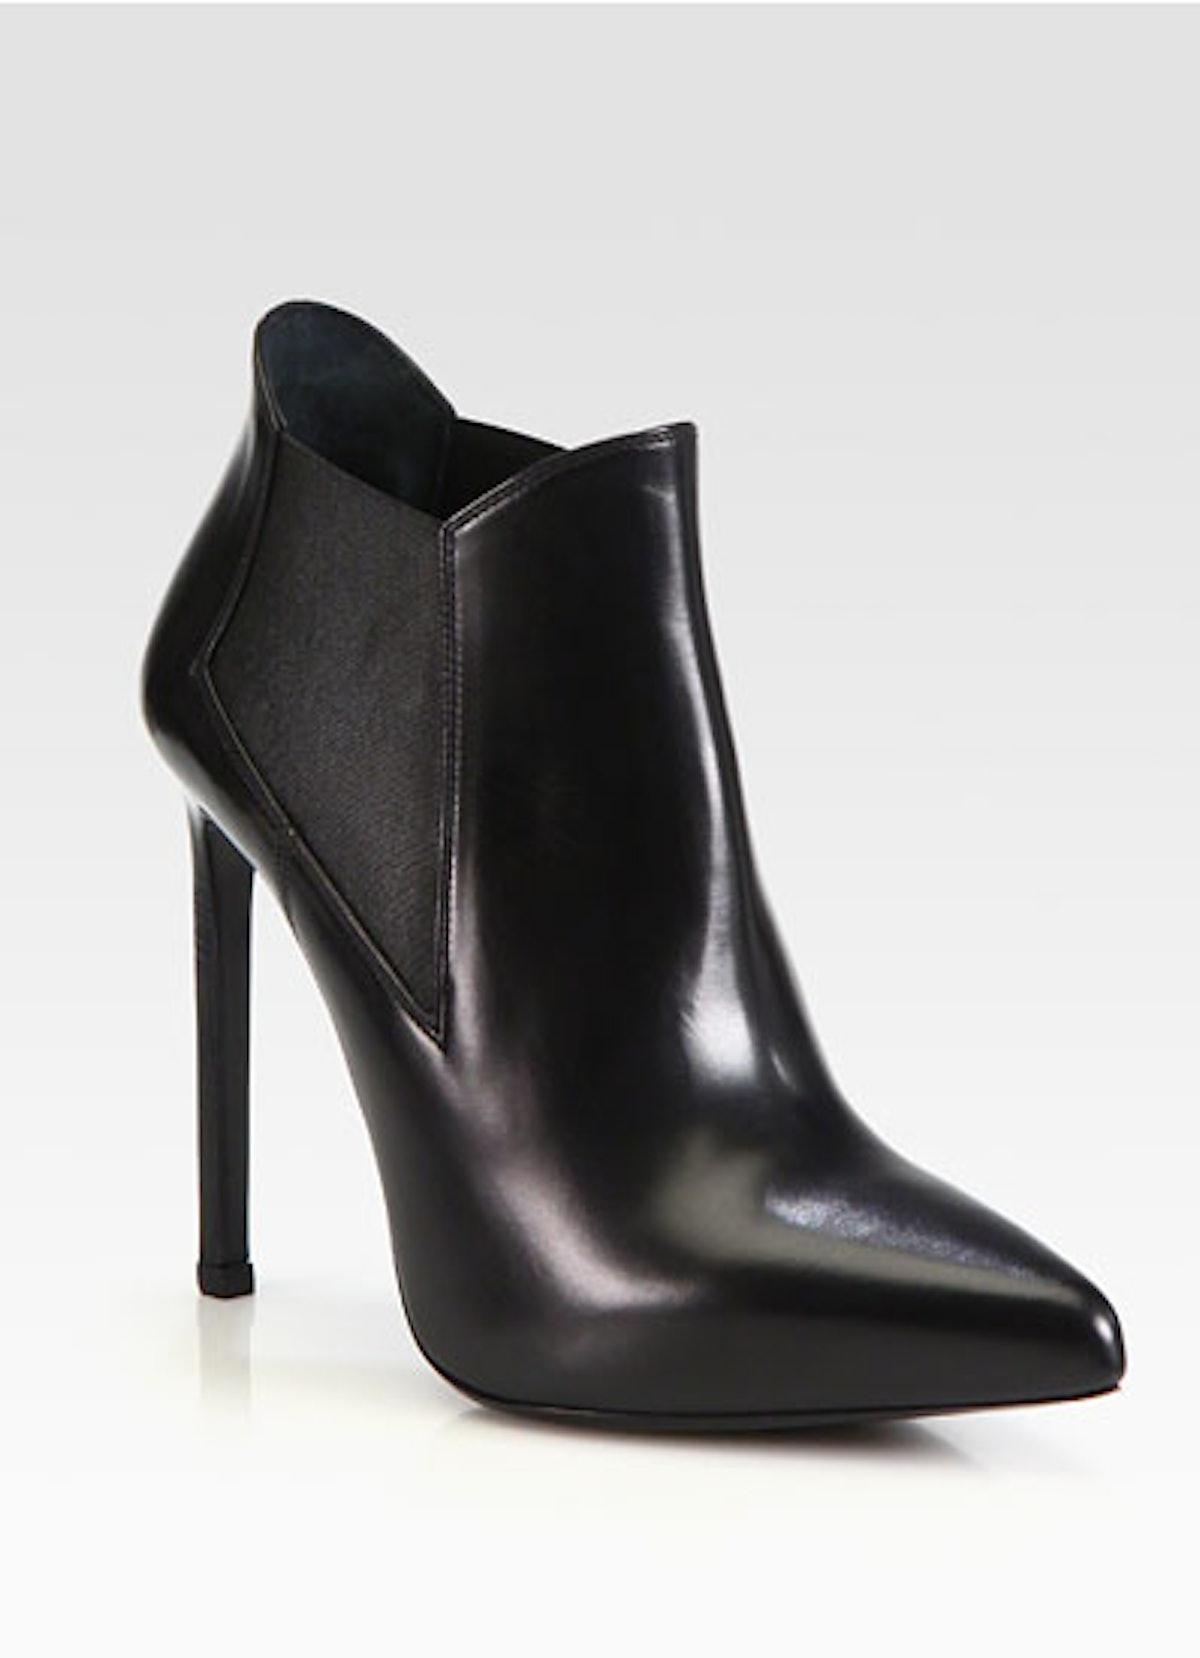 fass-flat-boot-trend-02-v.jpg